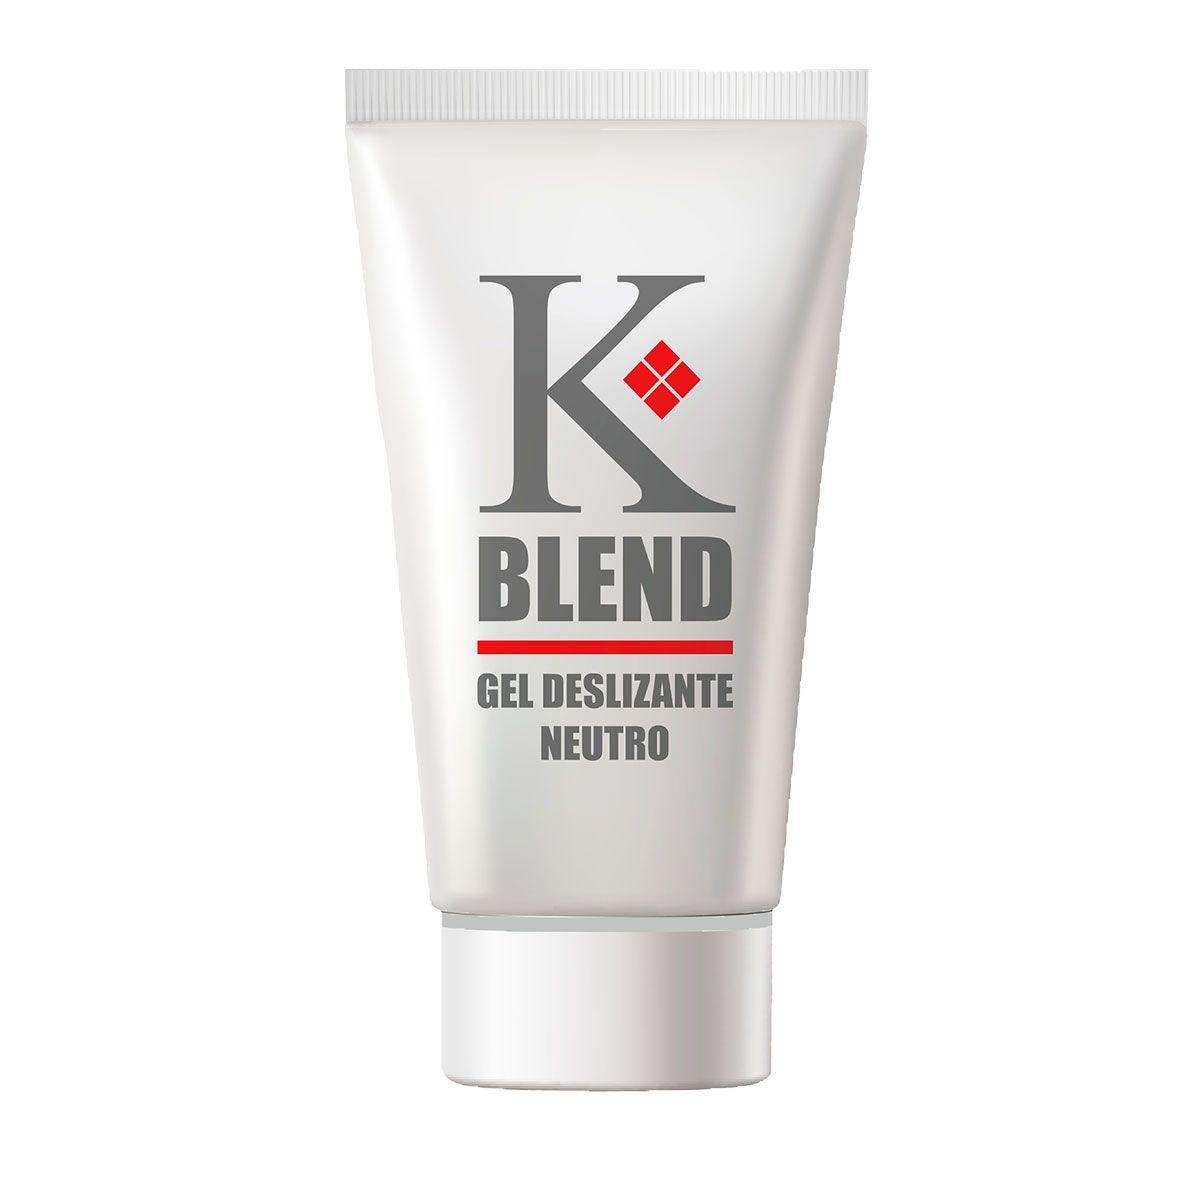 K blend